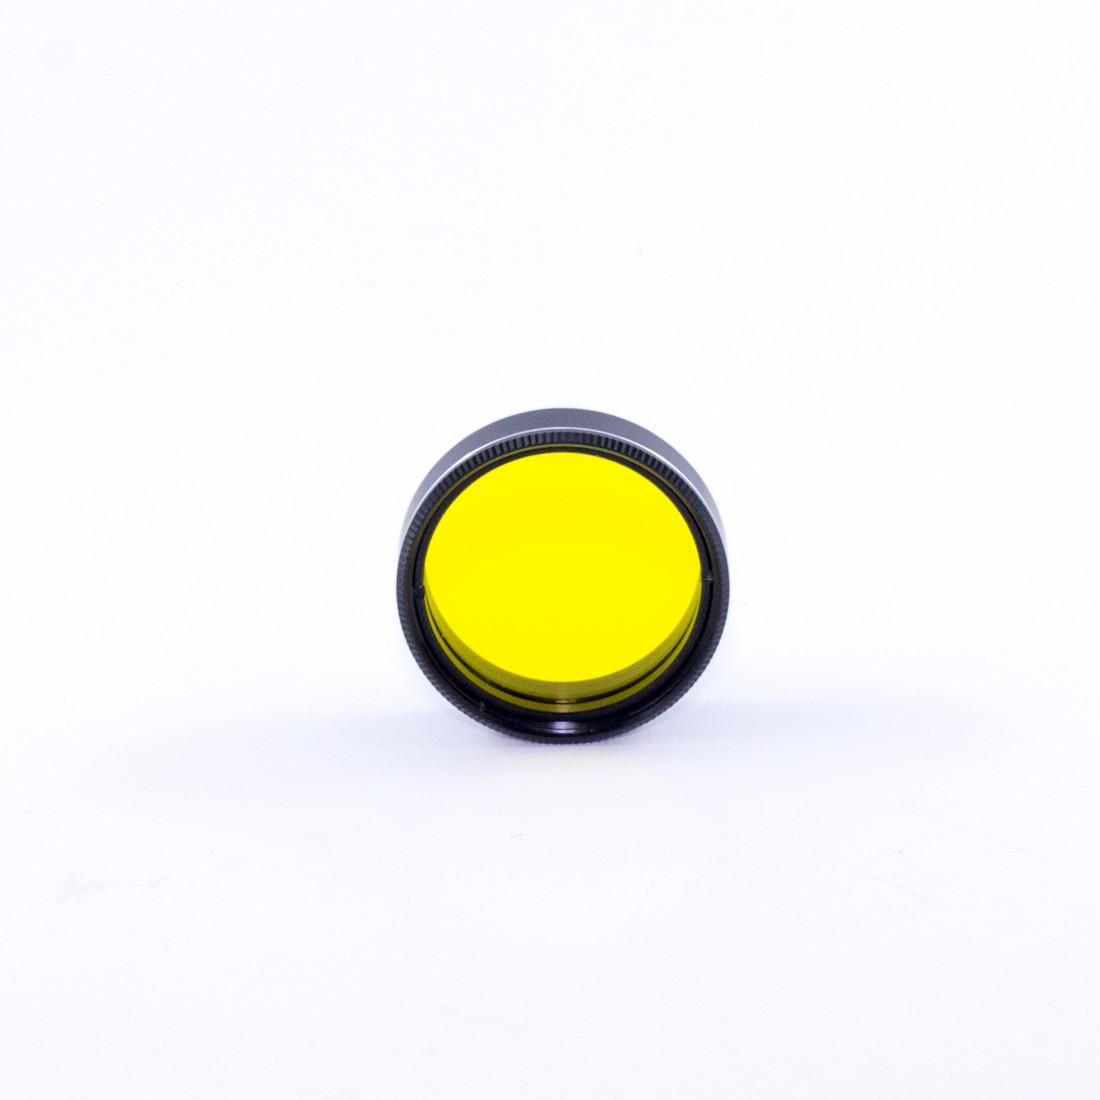 Sirius Colour Filter No. 8 Light Yellow